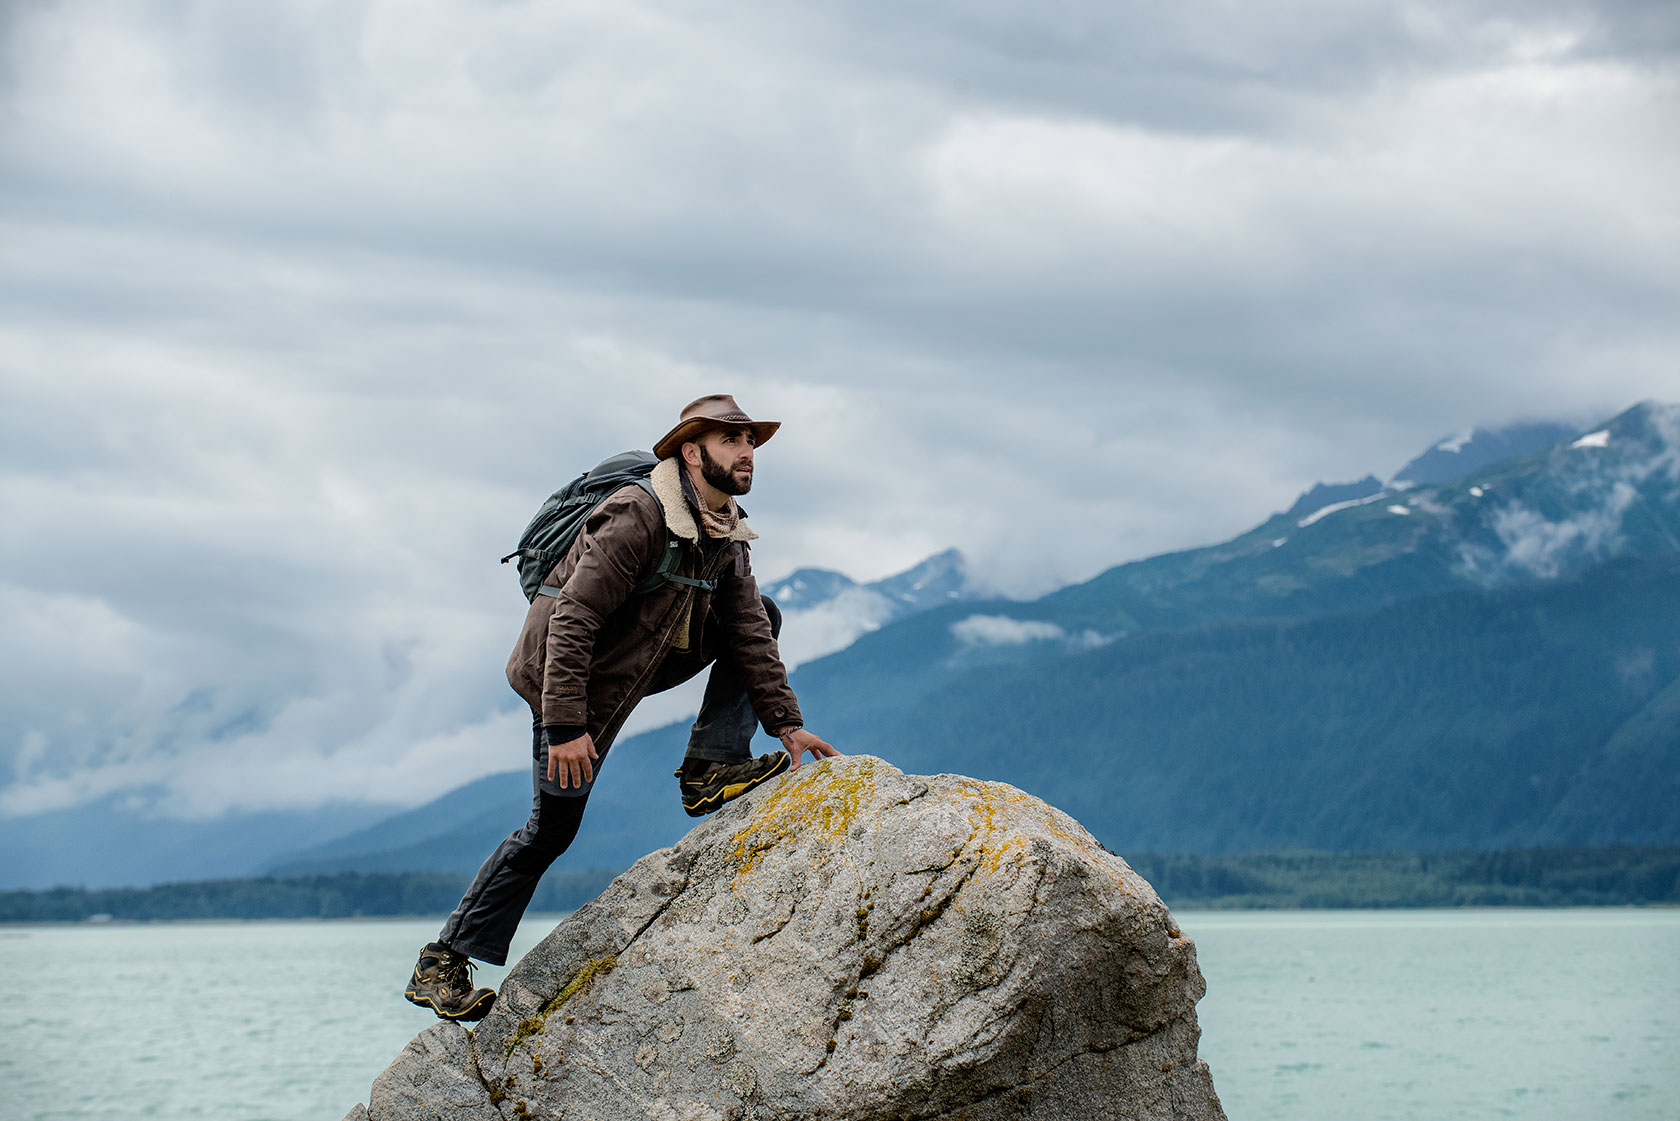 austin-trigg-brave-wilderness-alaska-BW-Coyote-Climbs-Rock.jpg